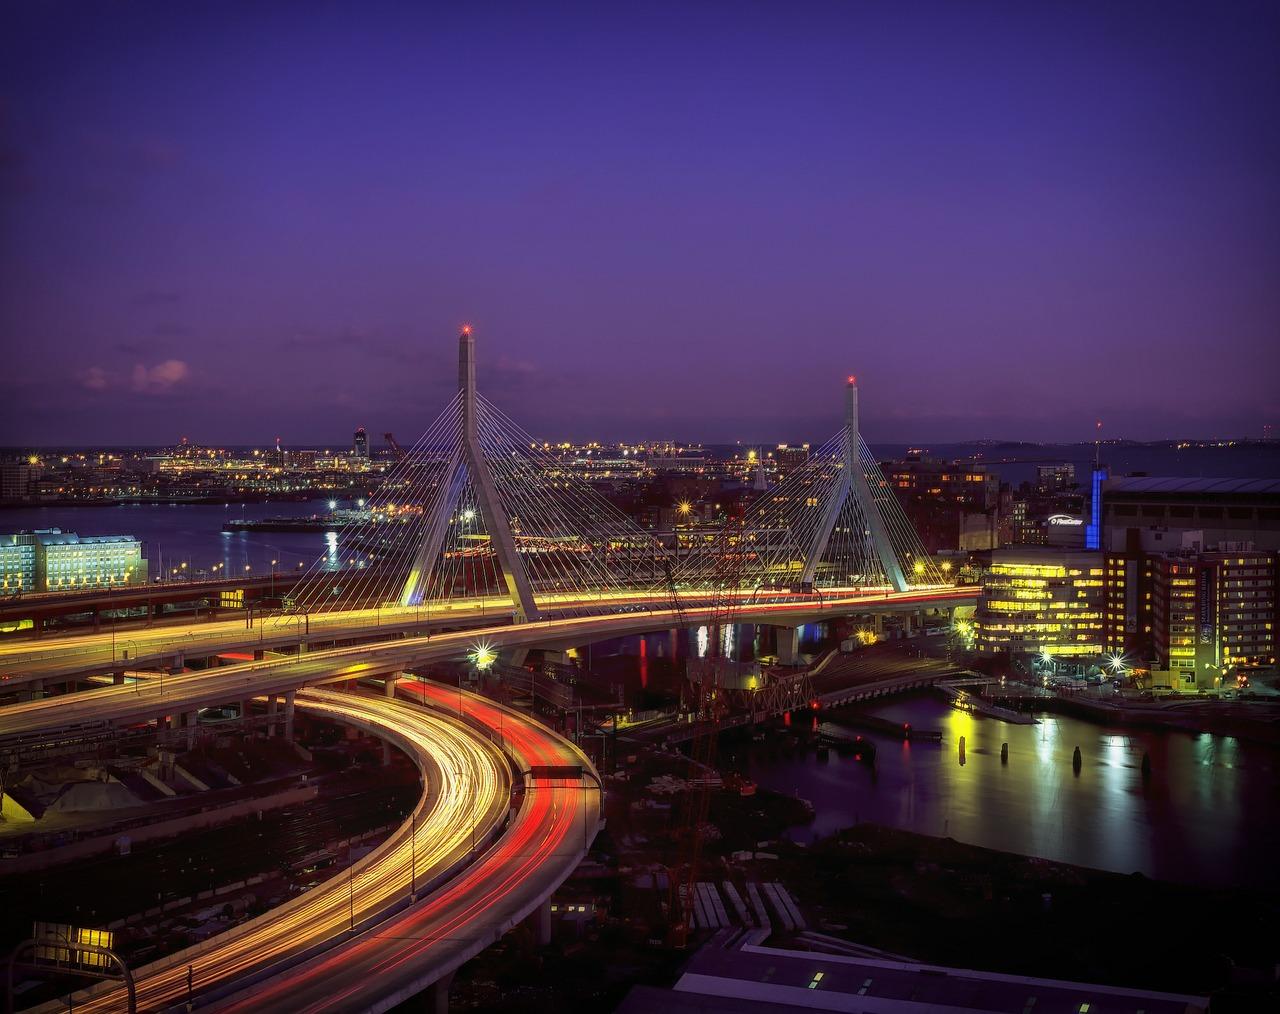 boston-404526_1280